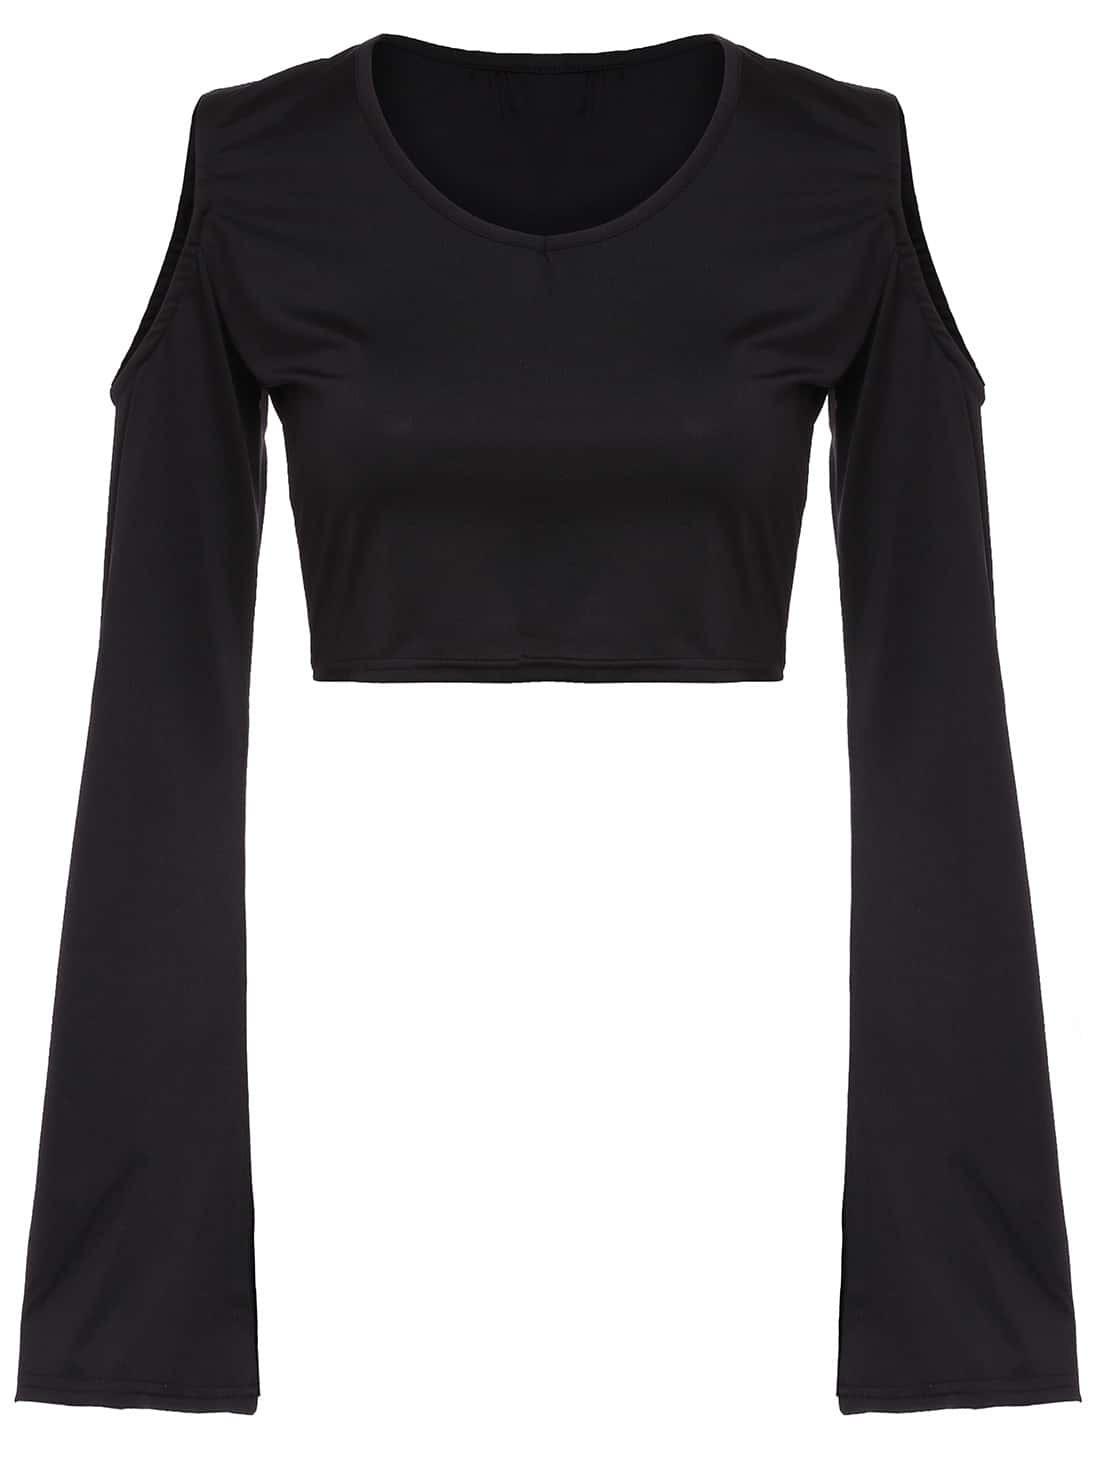 Bell Sleeve Open Shoulder Crop T Shirtfor Women Romwe